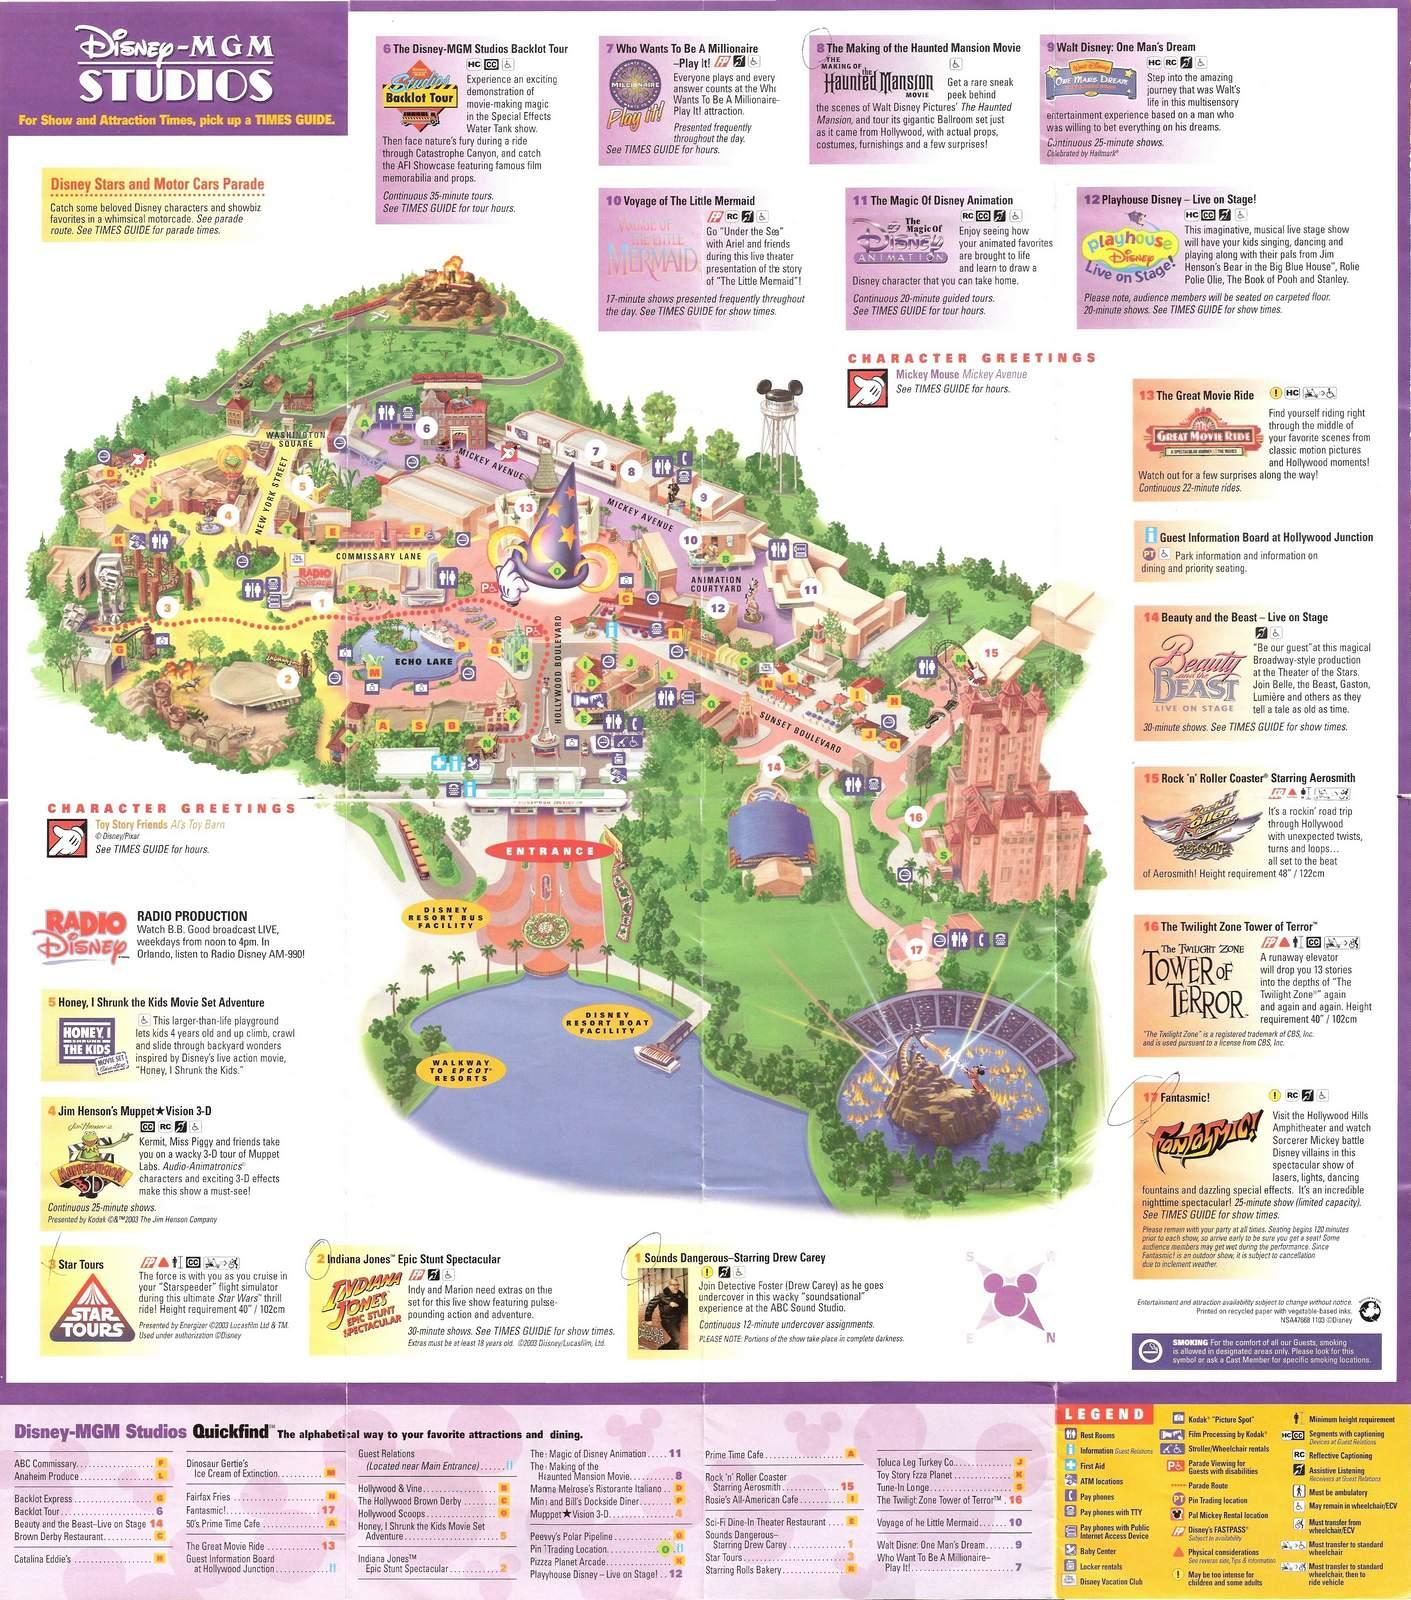 Crapstravaganza 19: Disney\'s MGM Studios 2003 | The DoD3